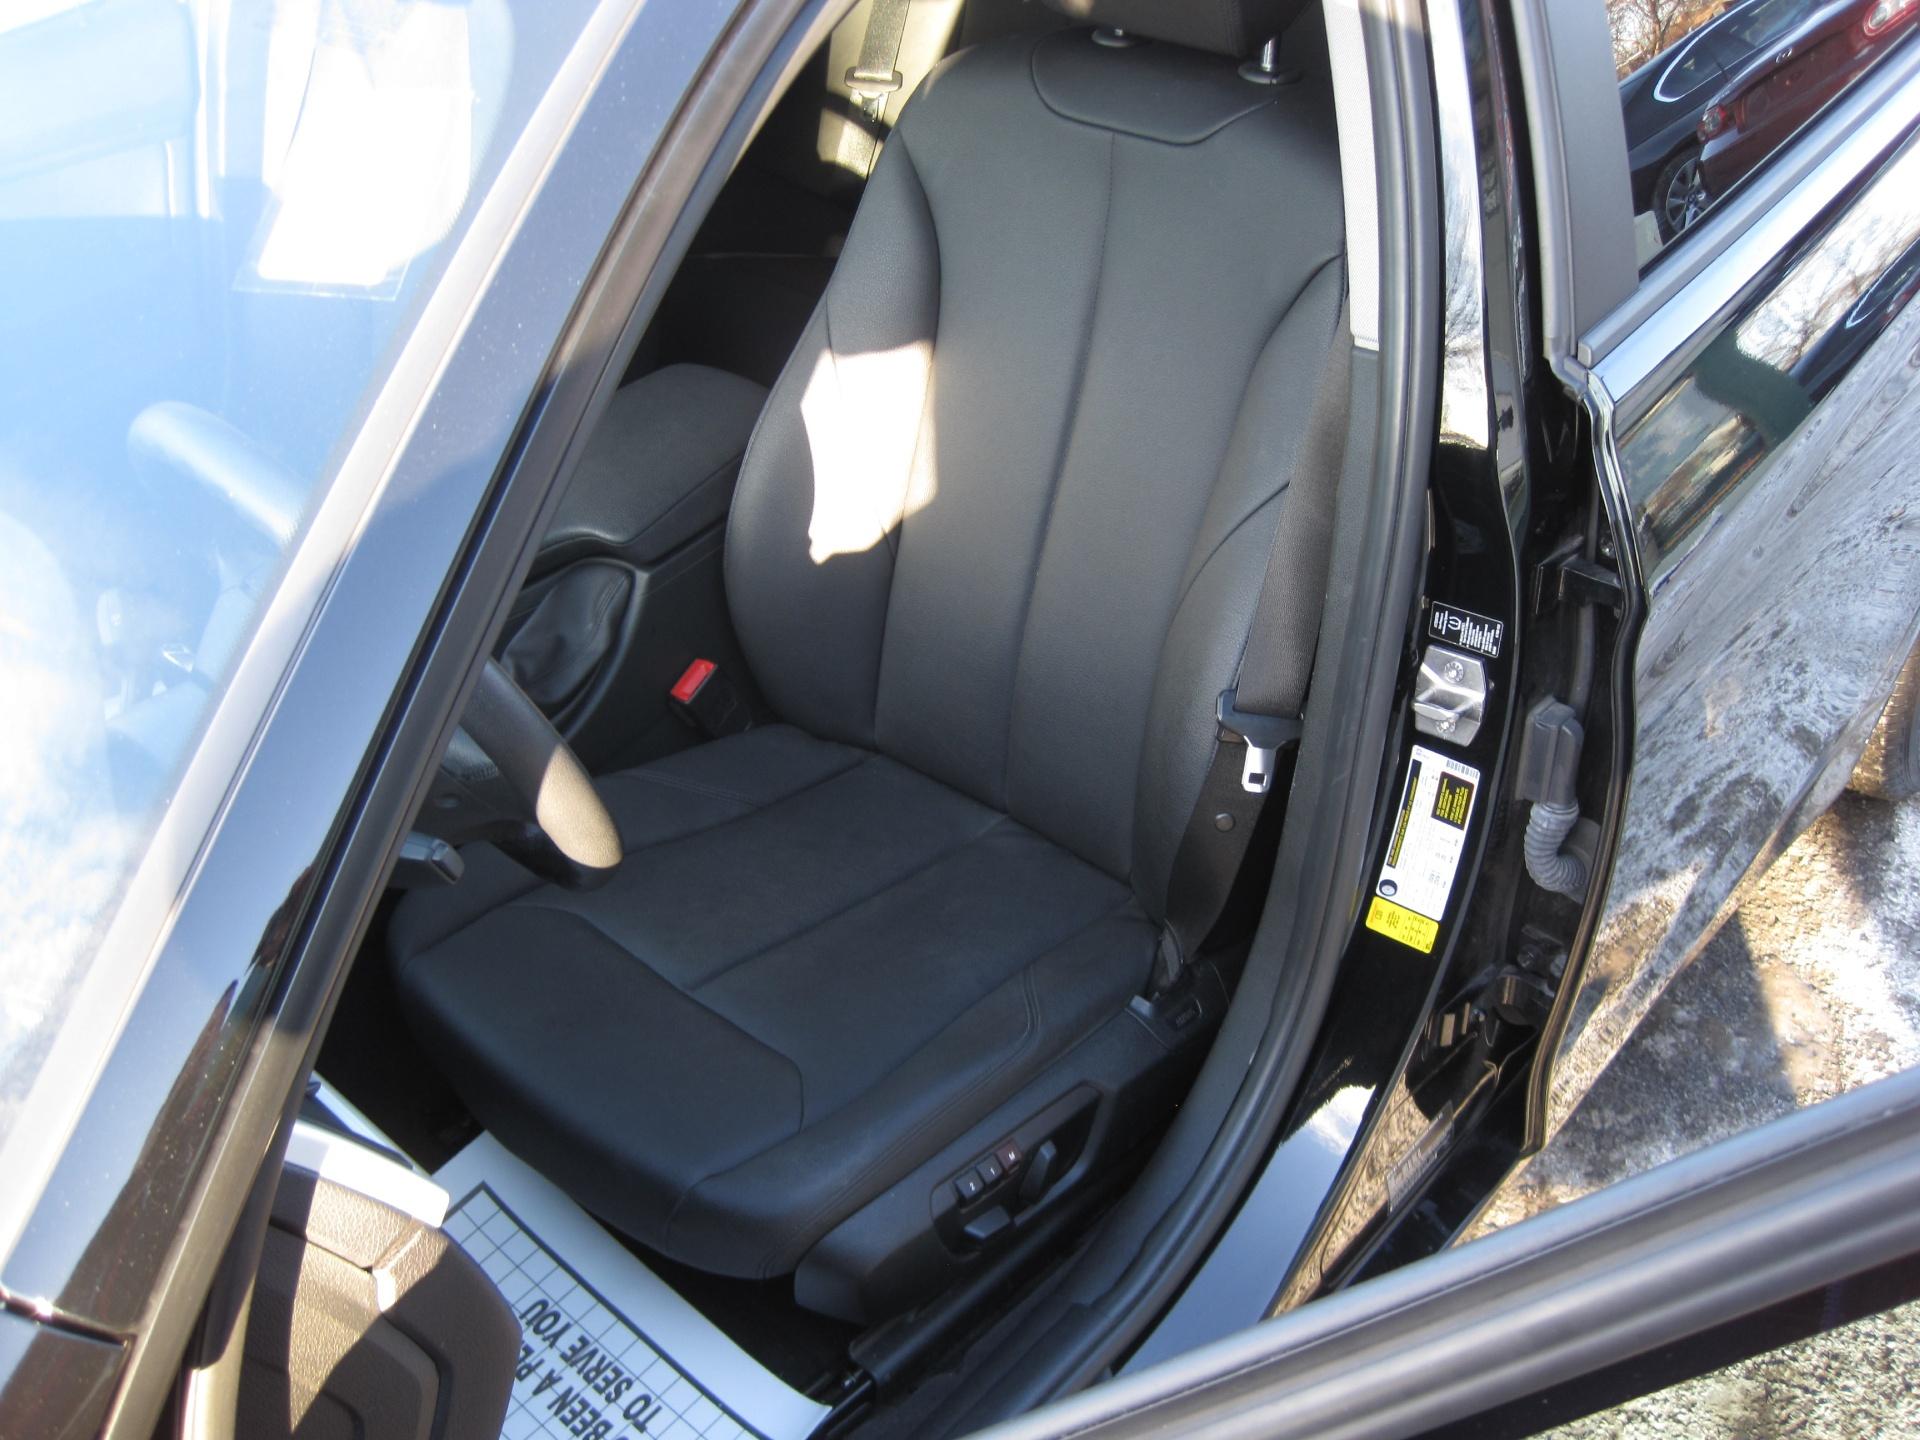 2013 bmw 3 series 328i navigation heated power seats black. Black Bedroom Furniture Sets. Home Design Ideas